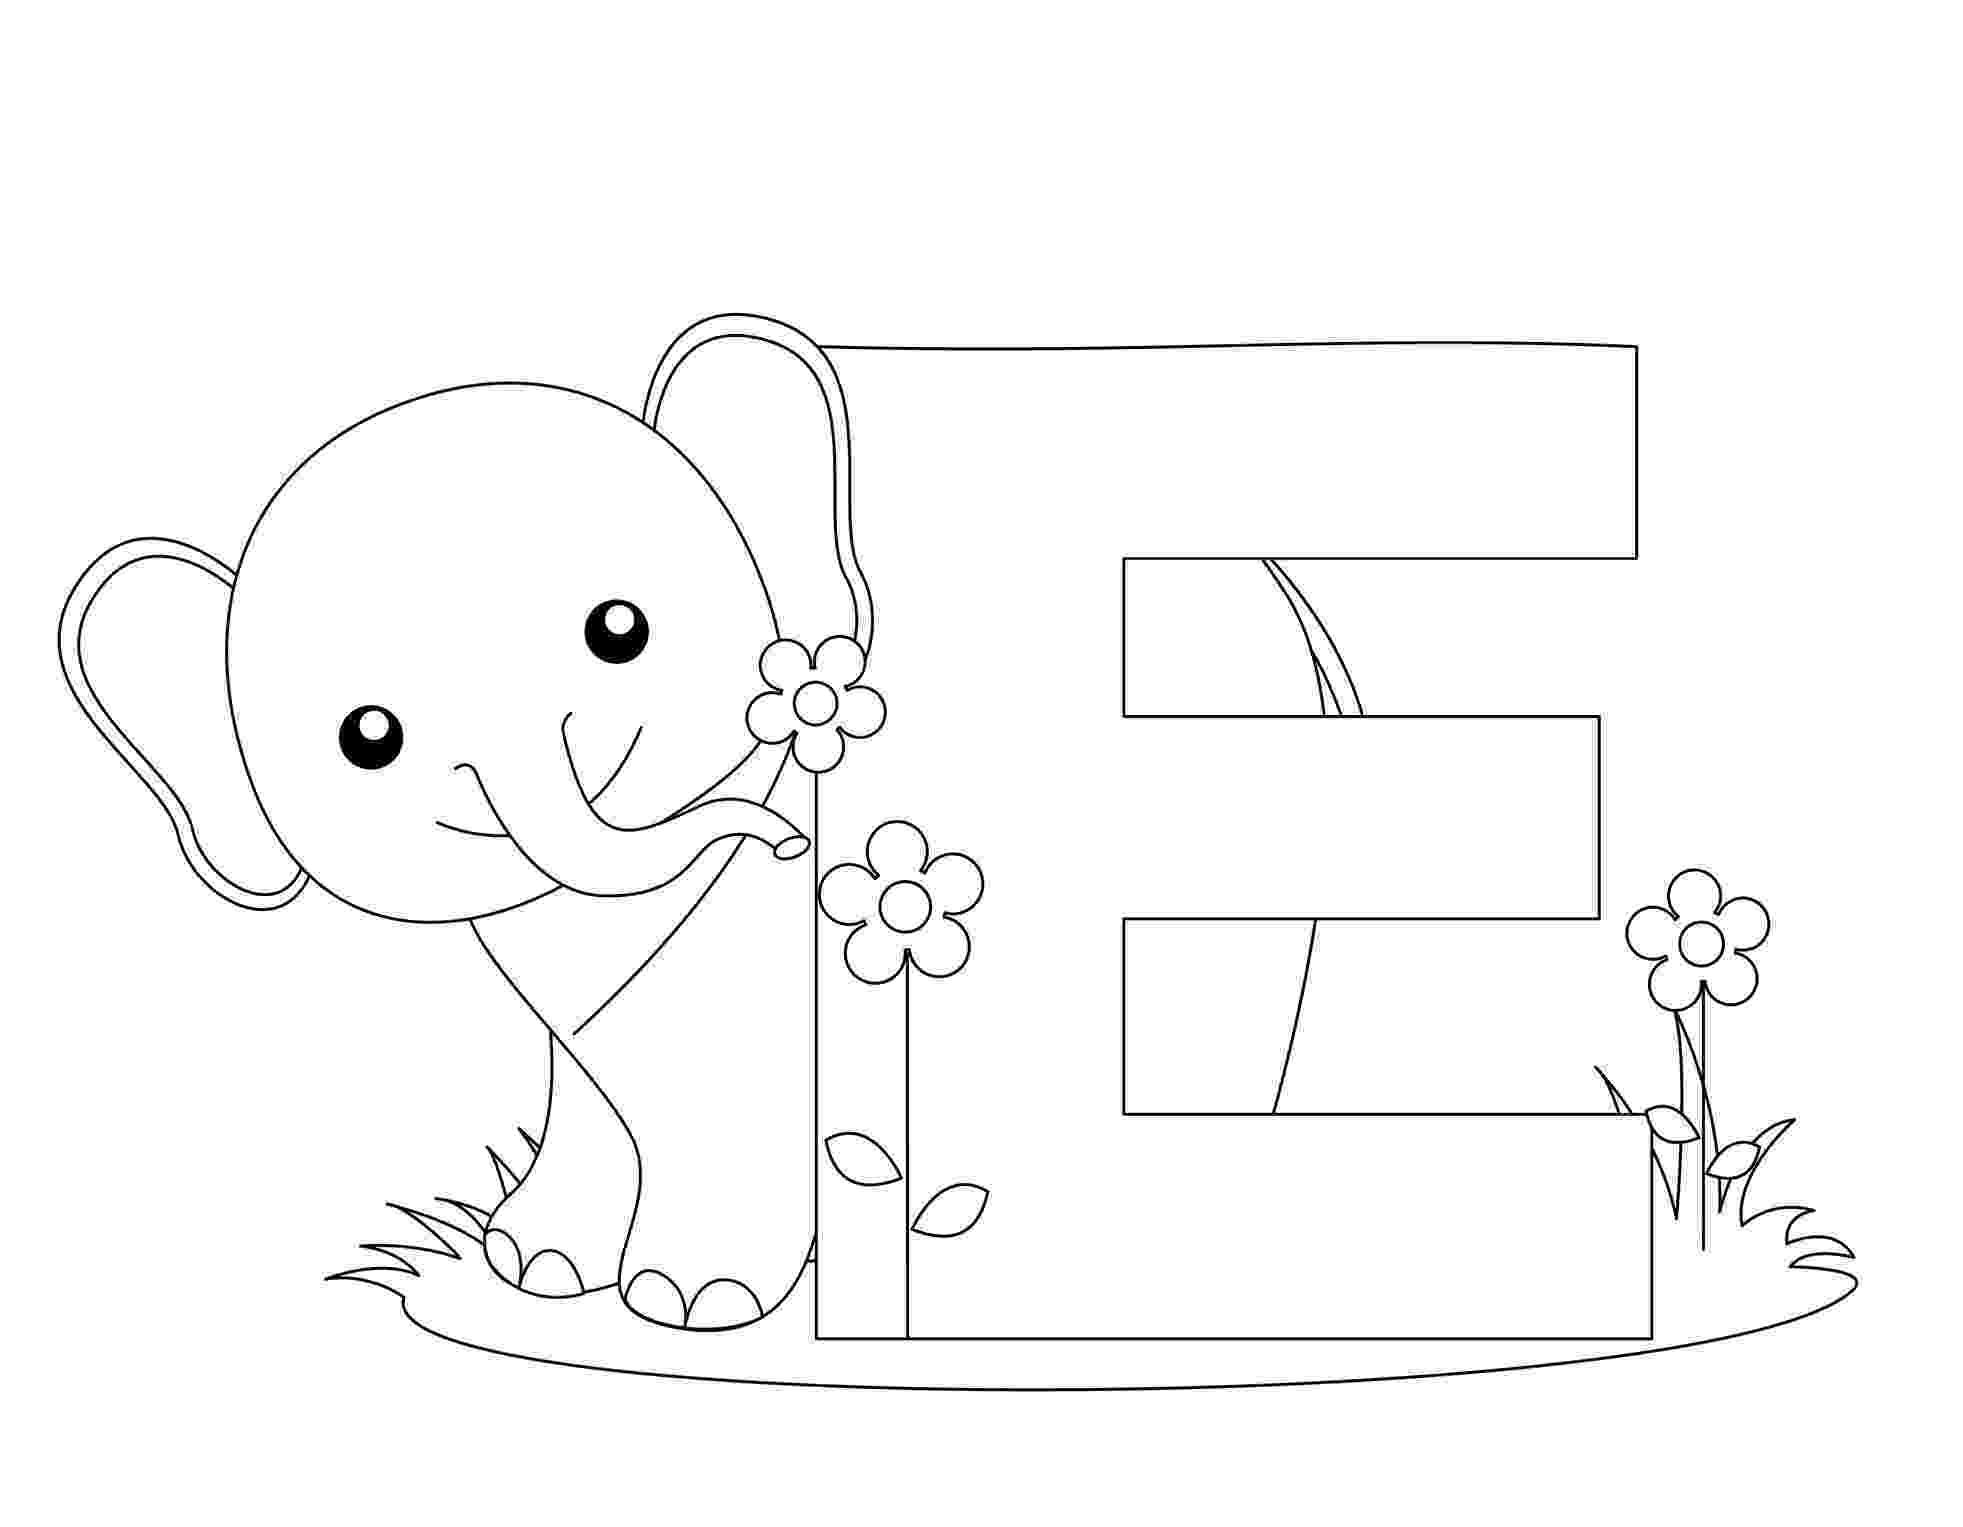 alphabet coloring free printable alphabet coloring pages for kids best alphabet coloring 1 5